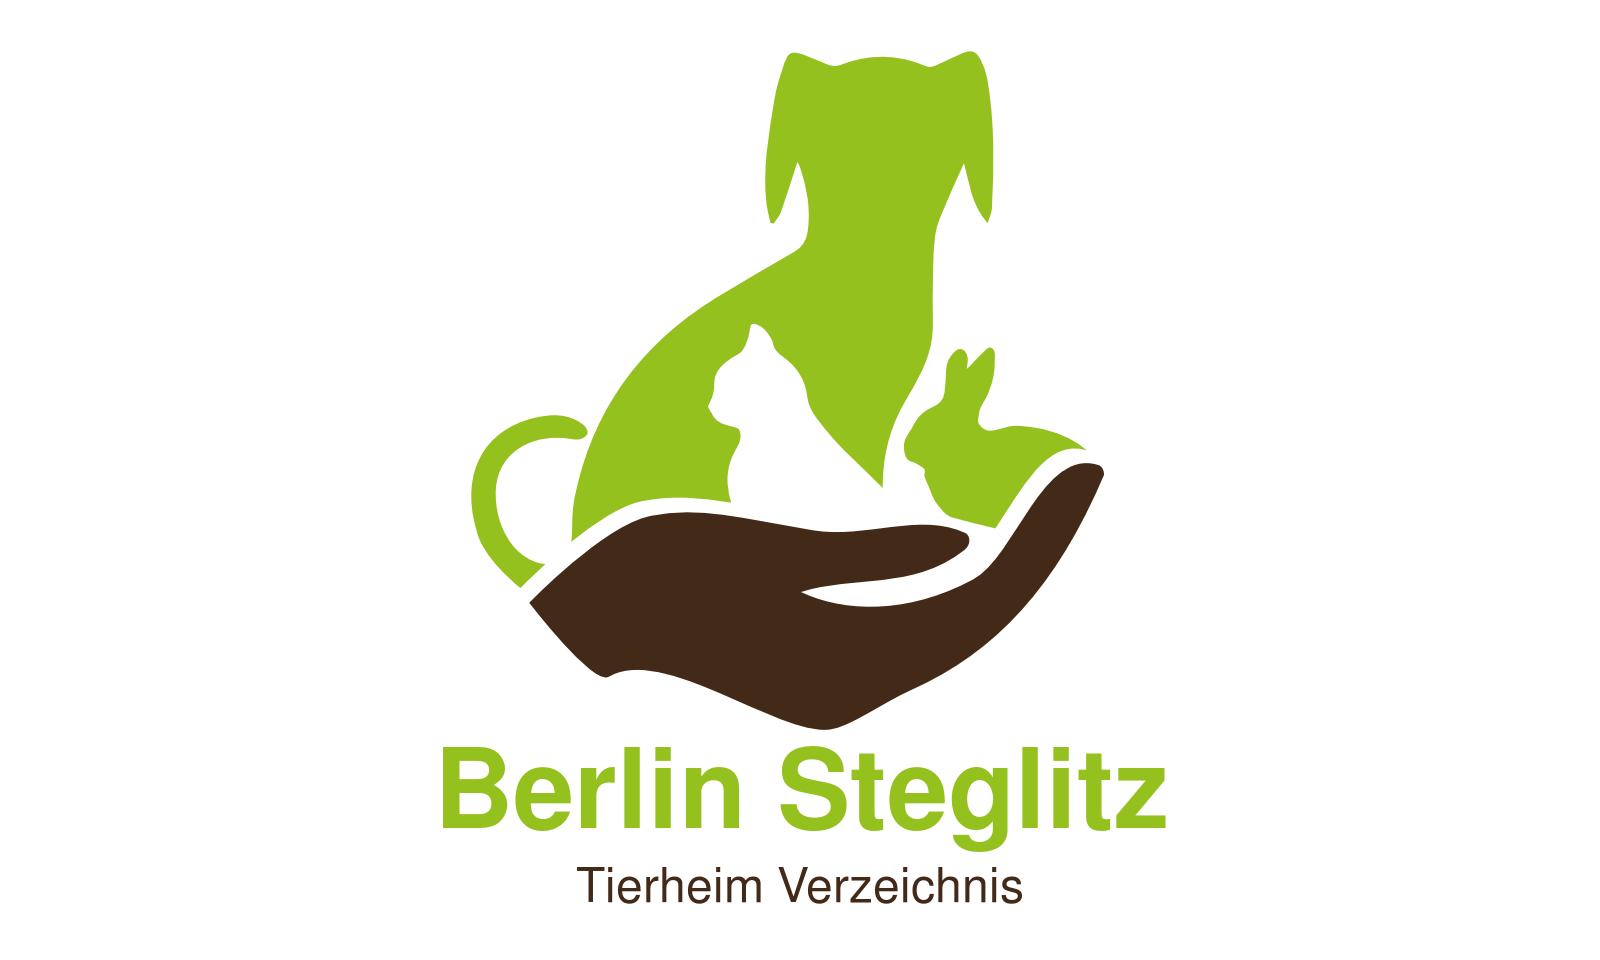 Tierheim Berlin Steglitz